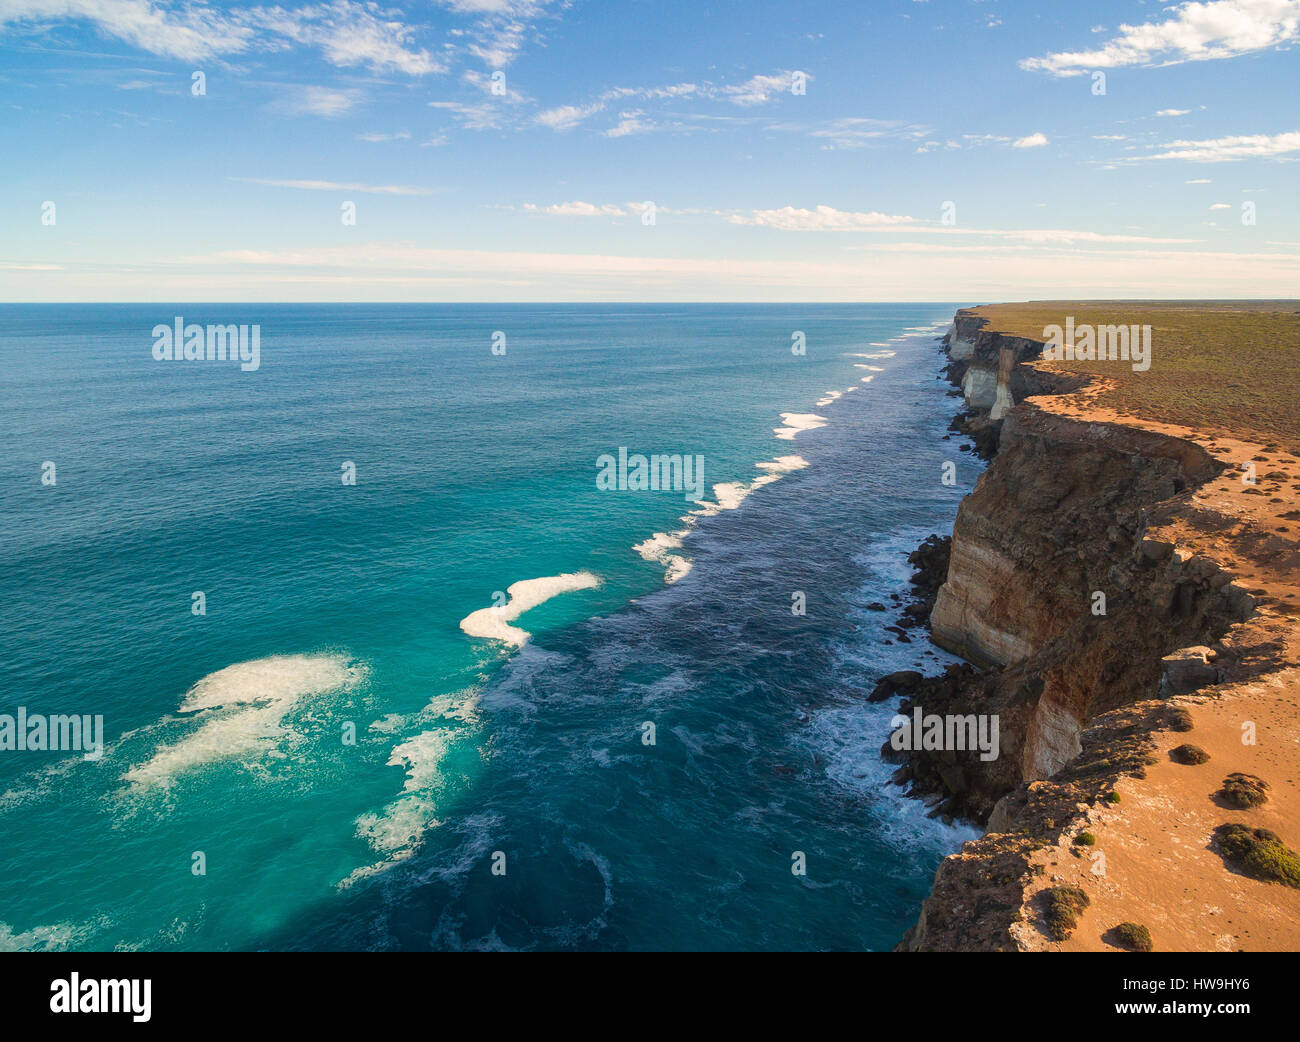 Der Great Australian Bight - Bunda Cliffs - Nullarbor Plains, Südaustralien Stockbild